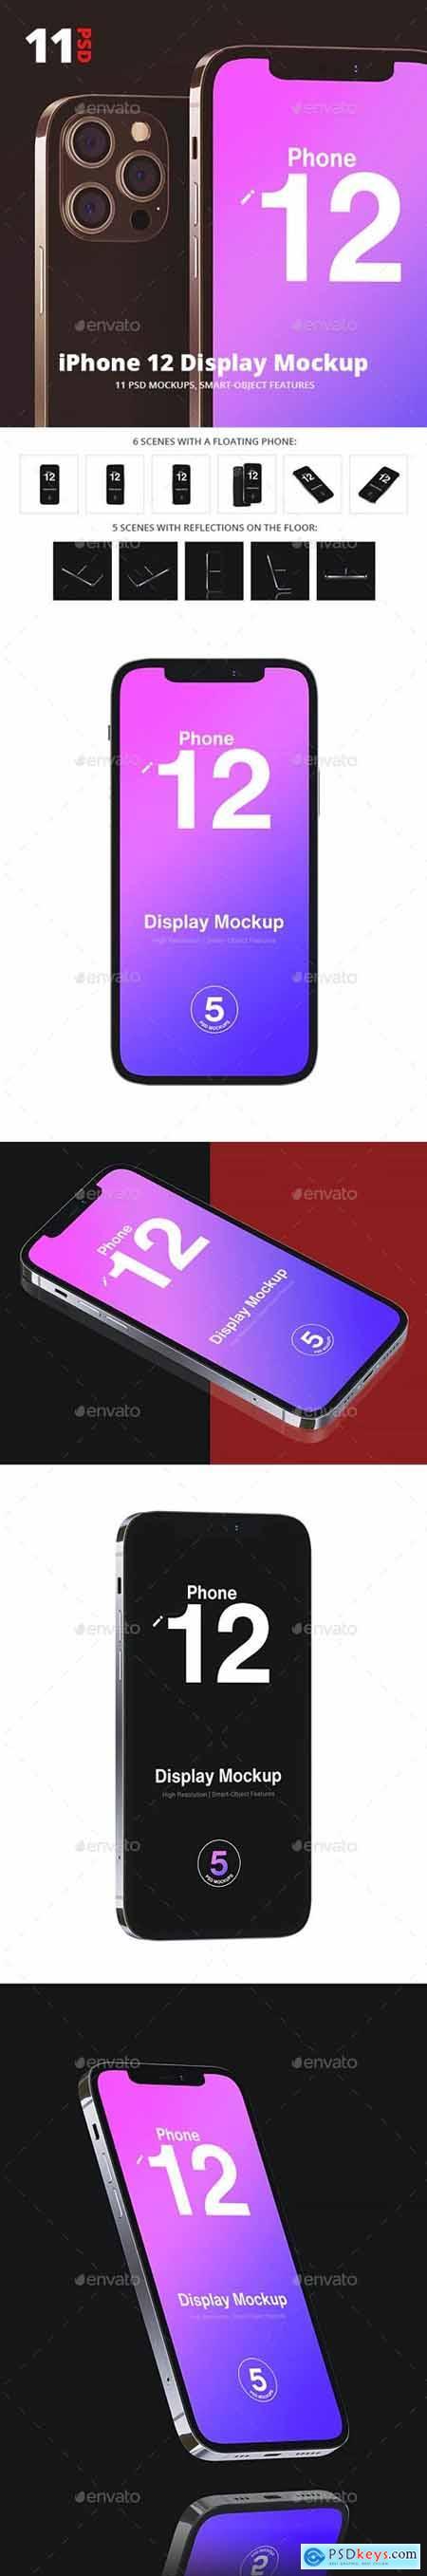 Phone 12 Mockup - 29430193